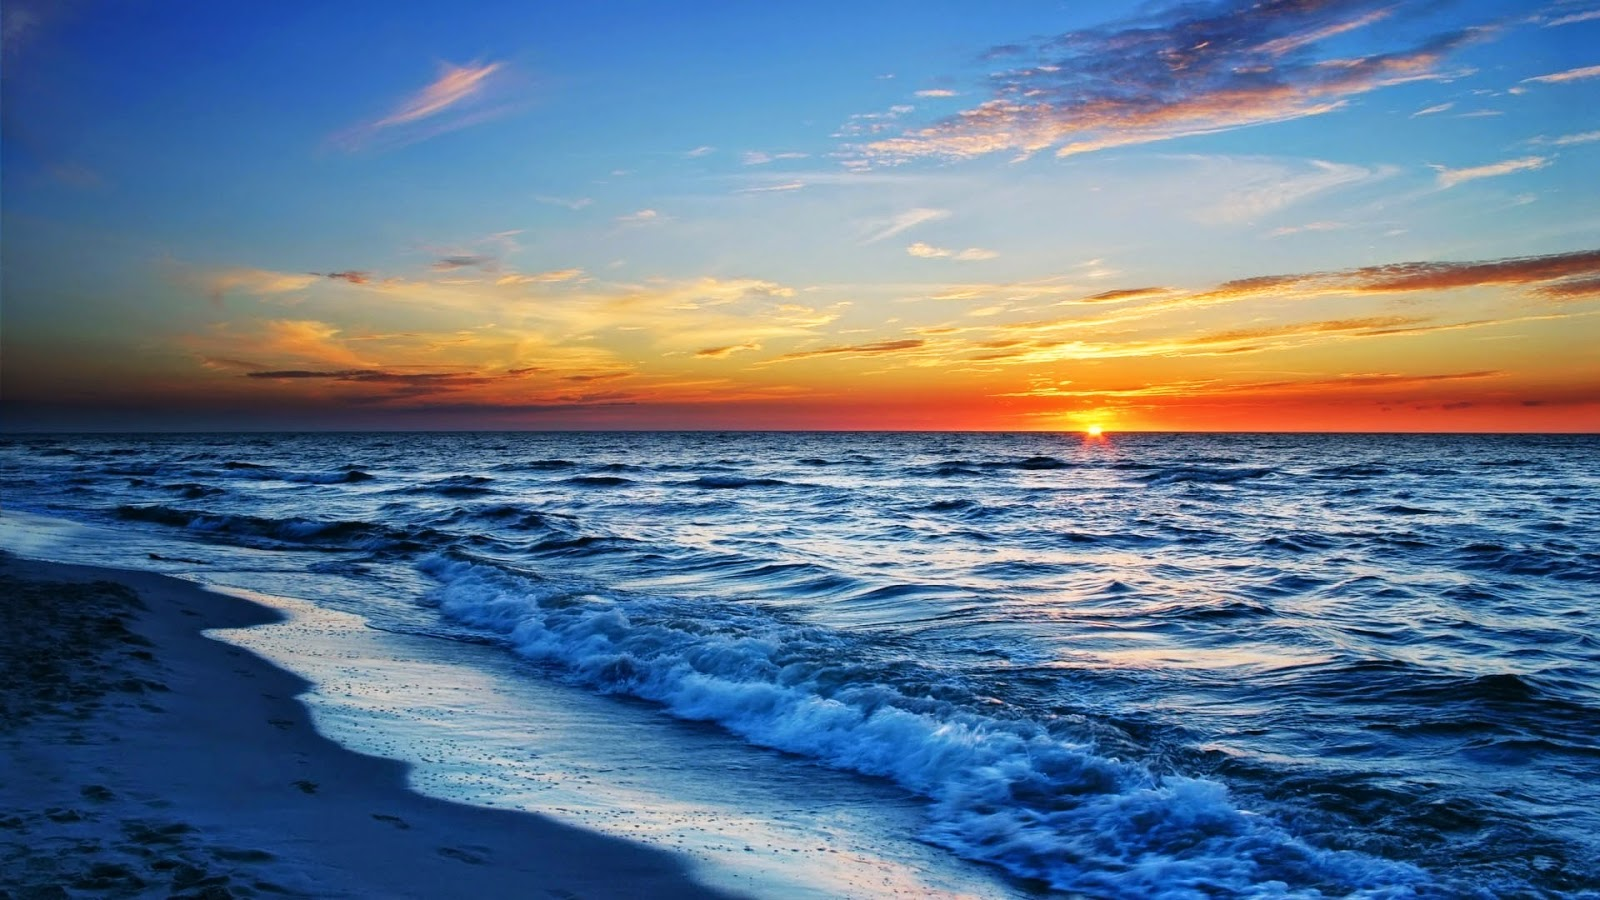 بالصور تفسير رؤيا البحر في المنام a8ab15ec30e617dae791e3746067f140